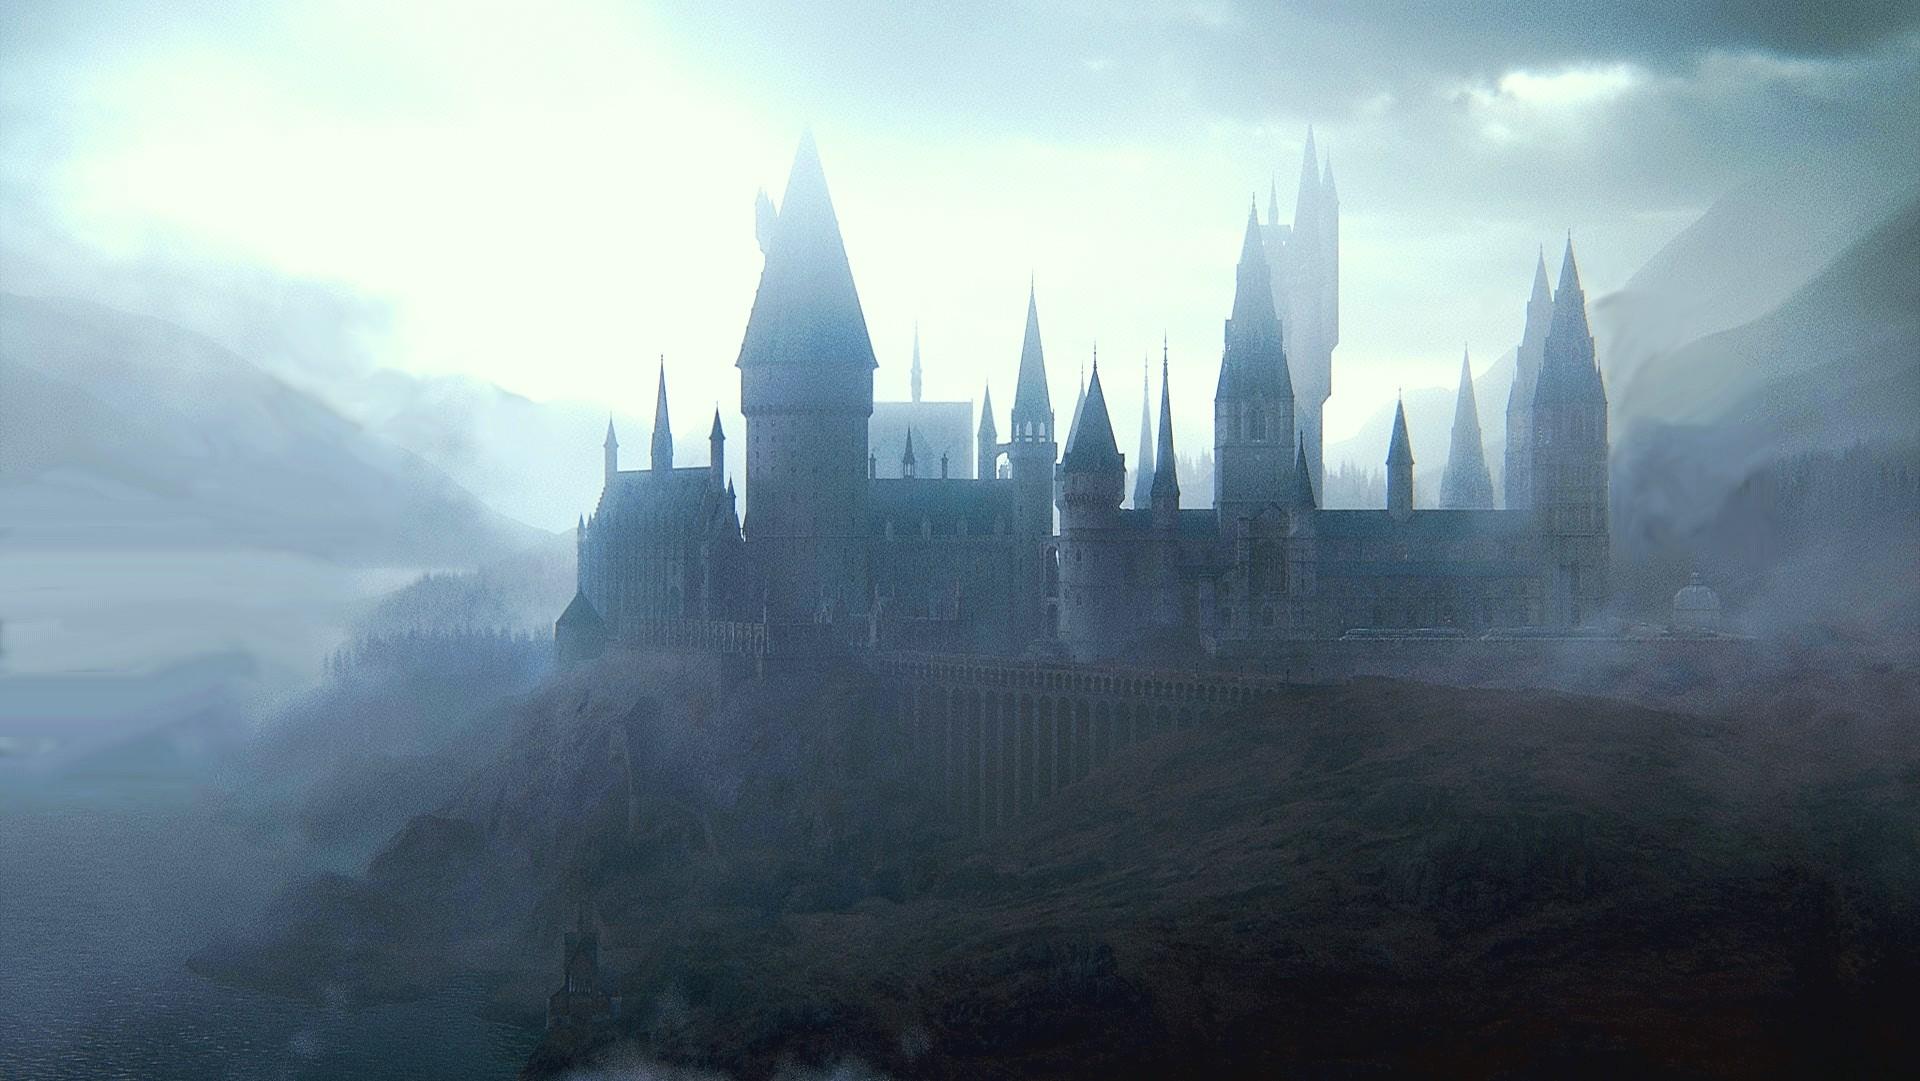 Most Inspiring Wallpaper Mac Harry Potter - 15721  Image_426263.jpg